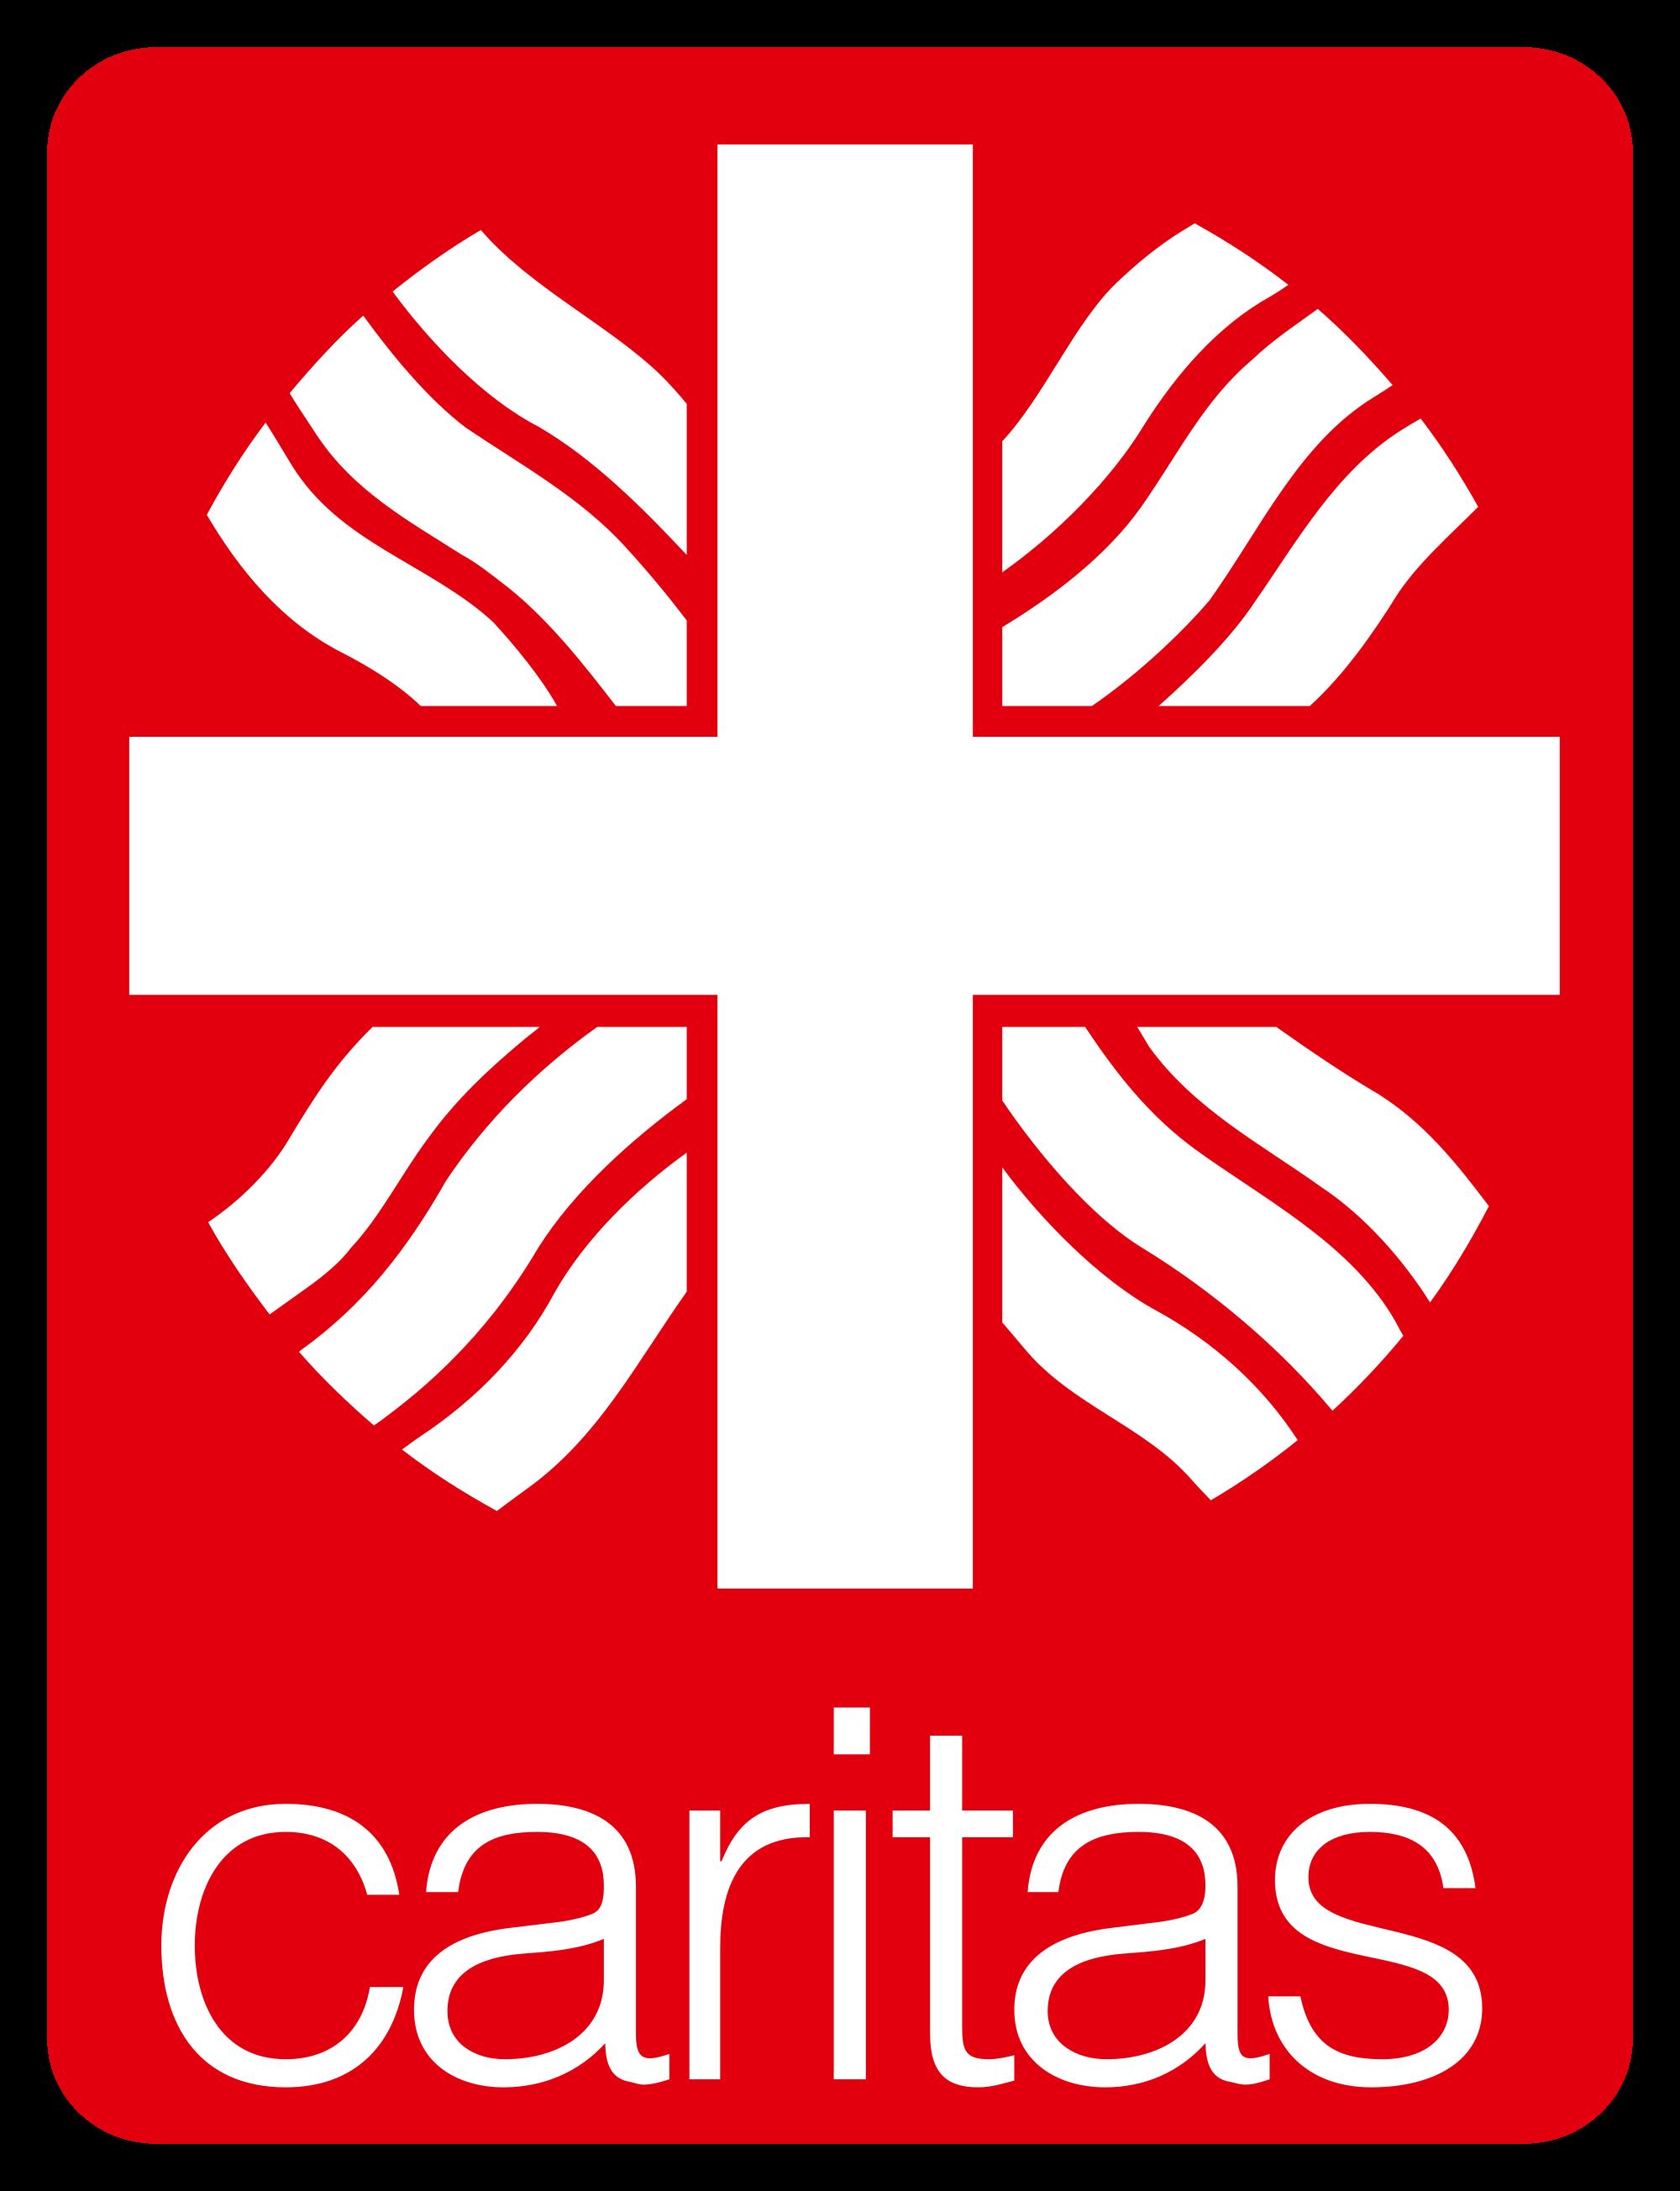 2000px-Caritas_logo.svg